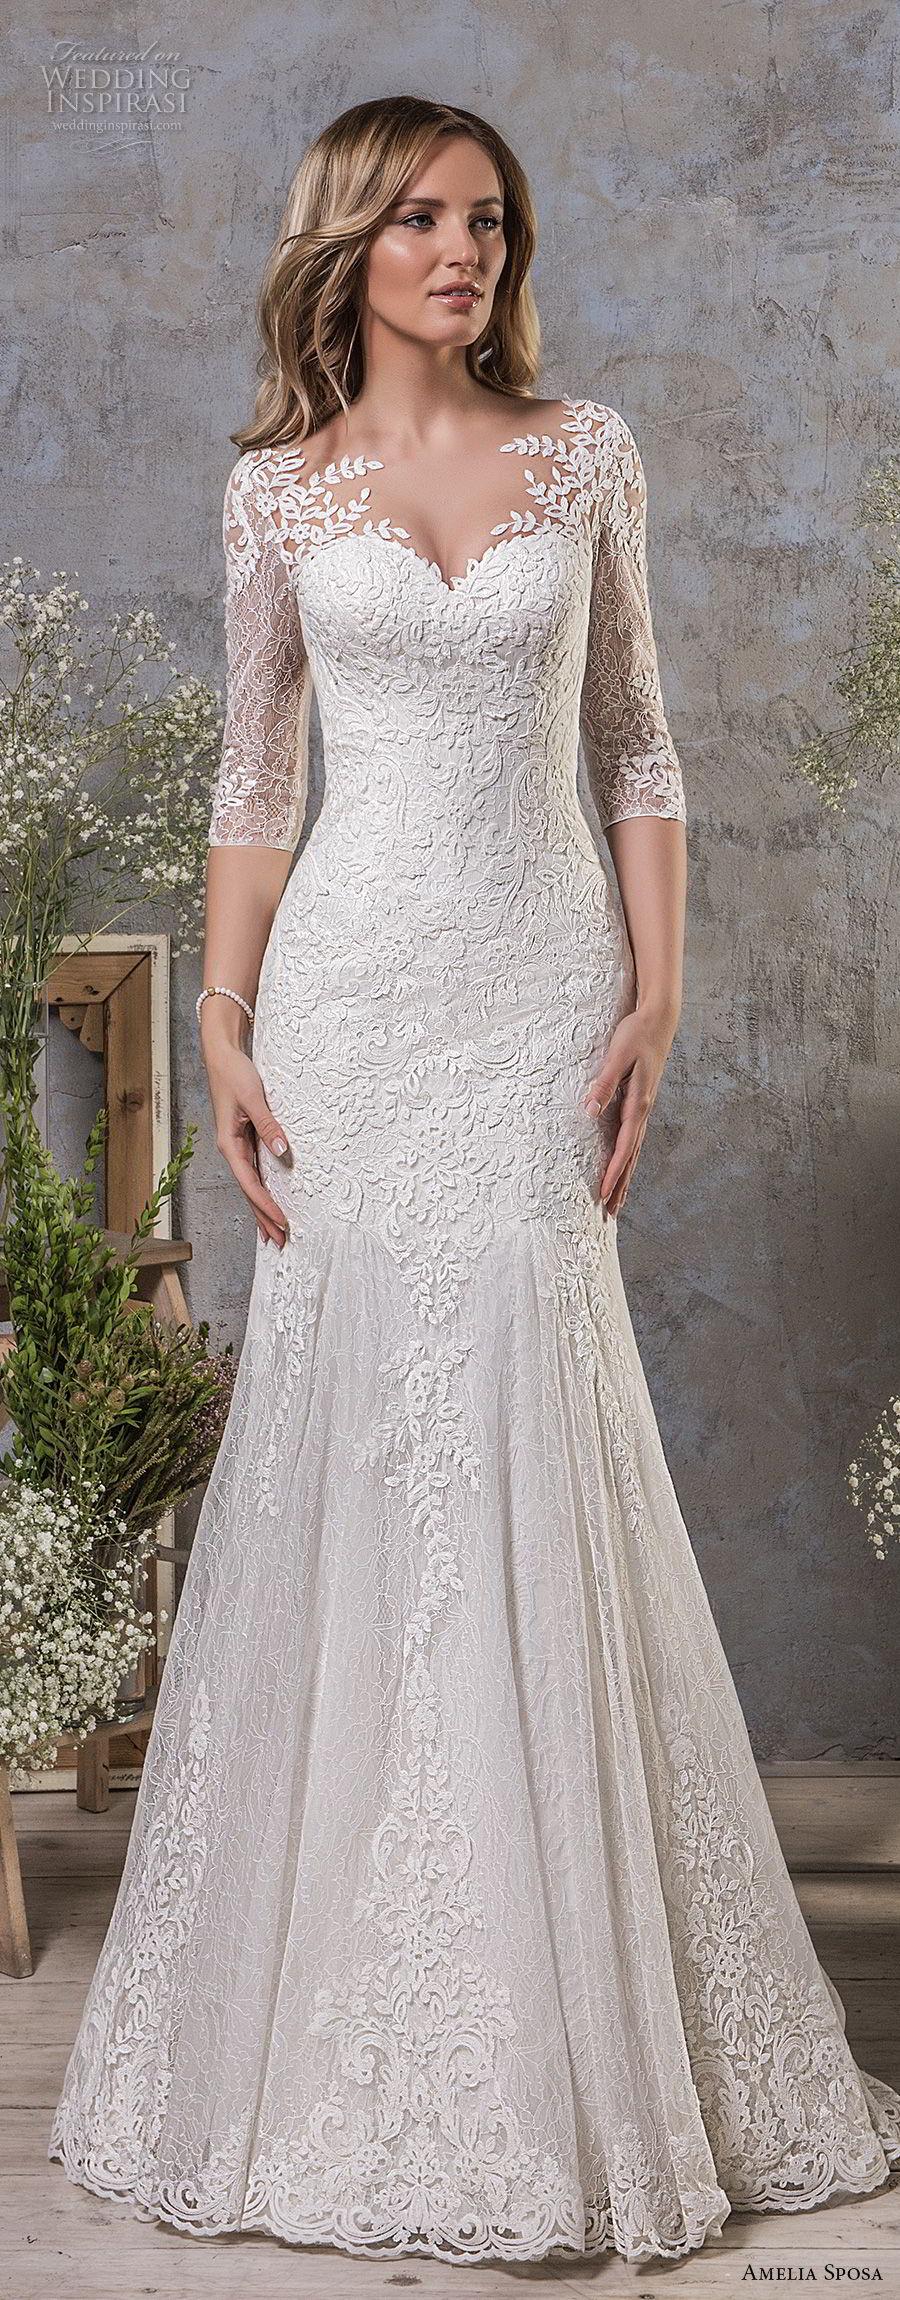 Amelia Sposa Fall 2018 Wedding Dresses Wedding Inspirasi Wedding Dresses Wedding Dresses Lace Best Wedding Dresses [ 2300 x 900 Pixel ]